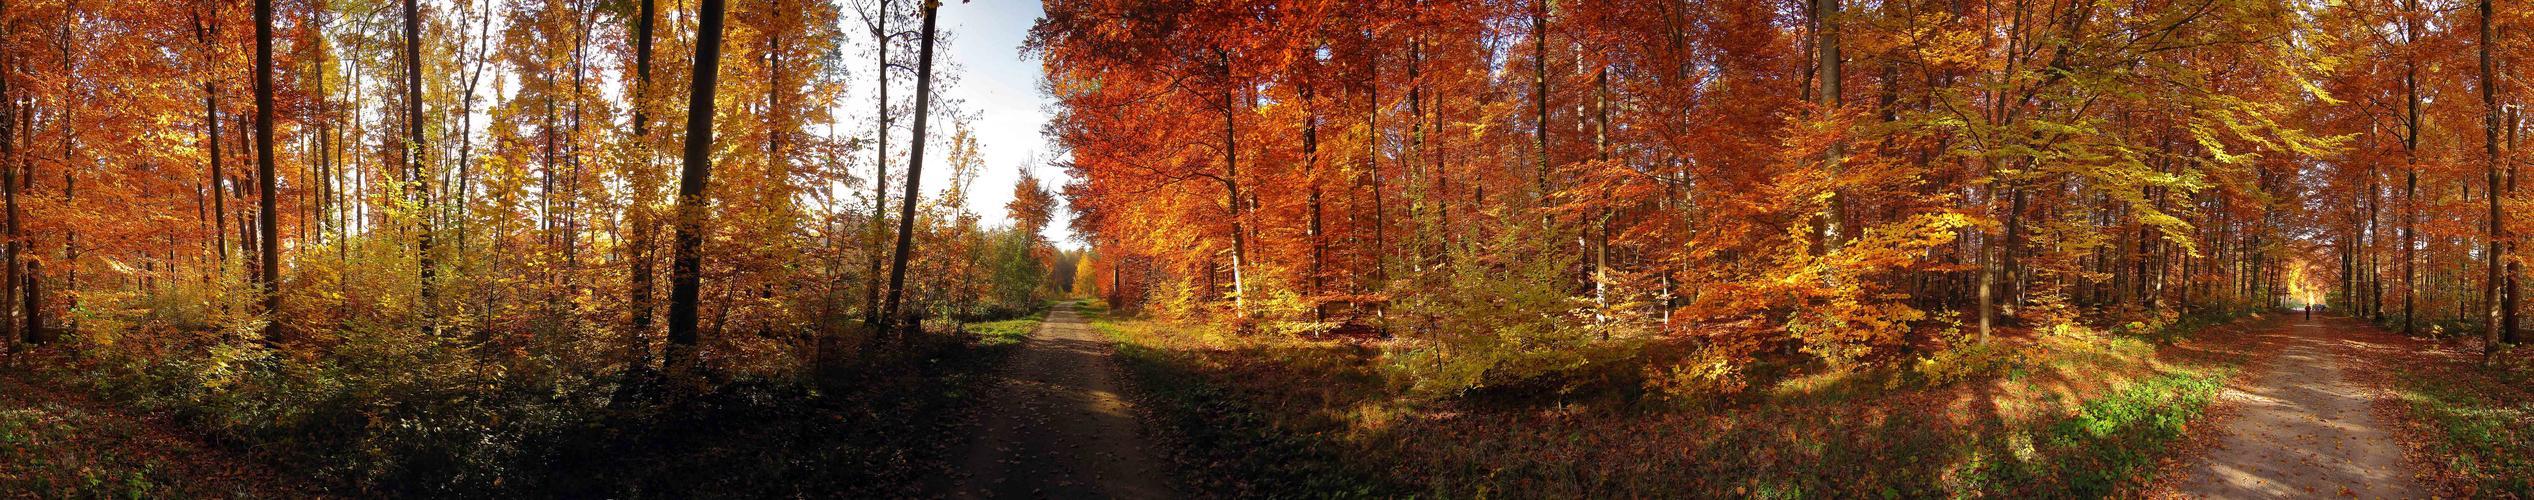 Herbstpanorama